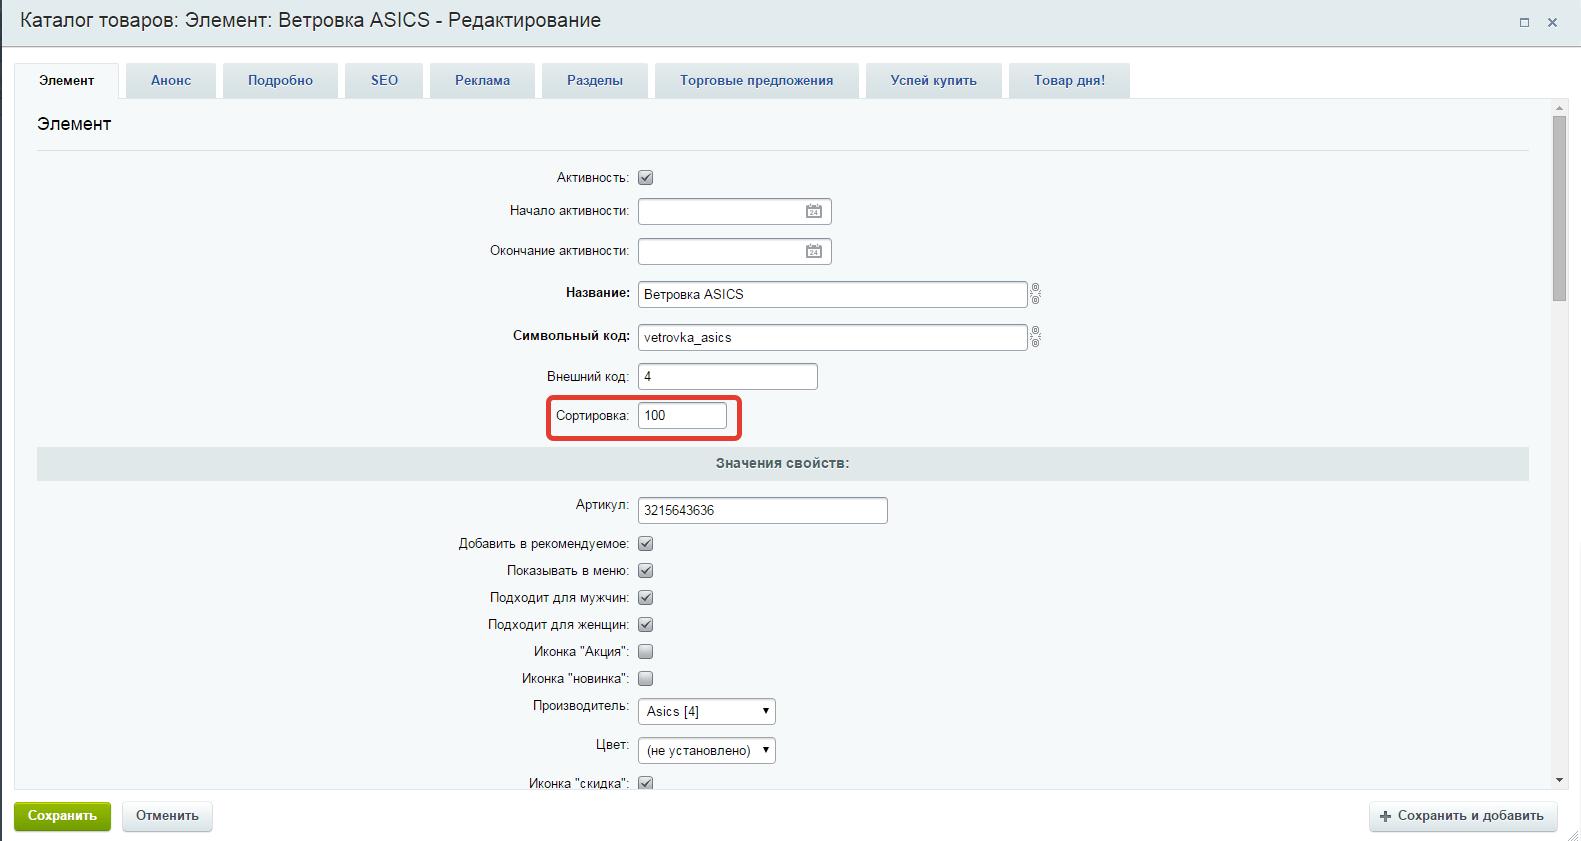 Сортировка по популярности товара битрикс структура файлов в битрикс